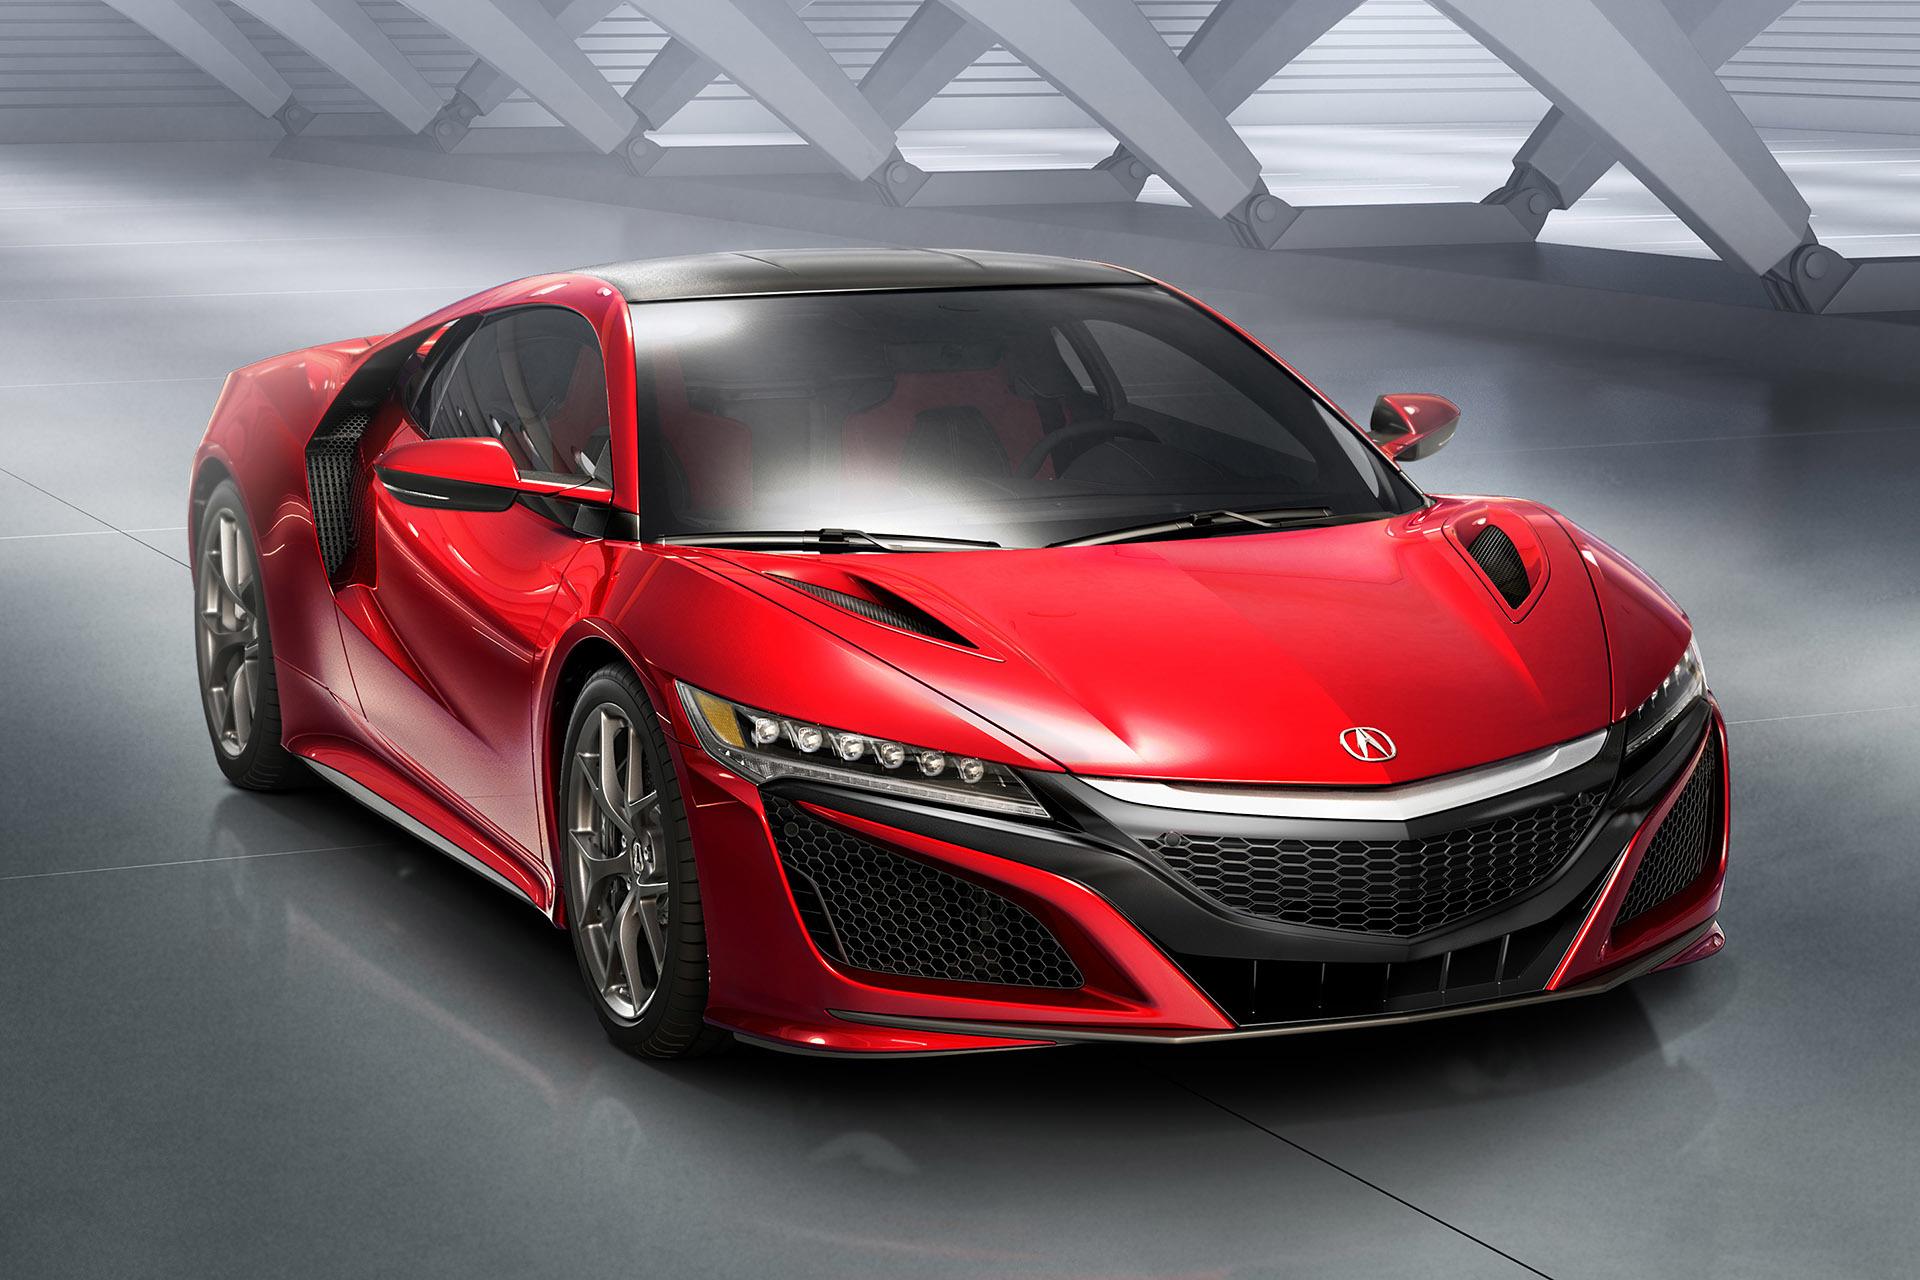 Acura Reveals AllNew Production NSX at 2015 Detroit Auto Show